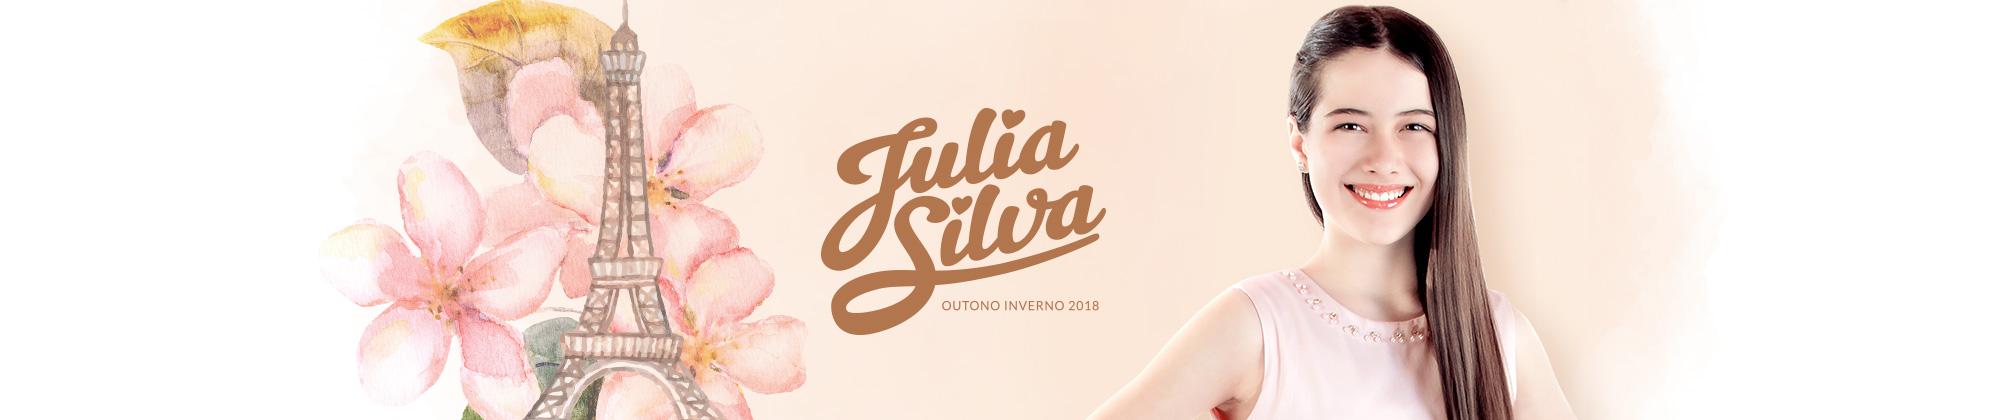 Outono / Inverno 2018 - Julia Silva